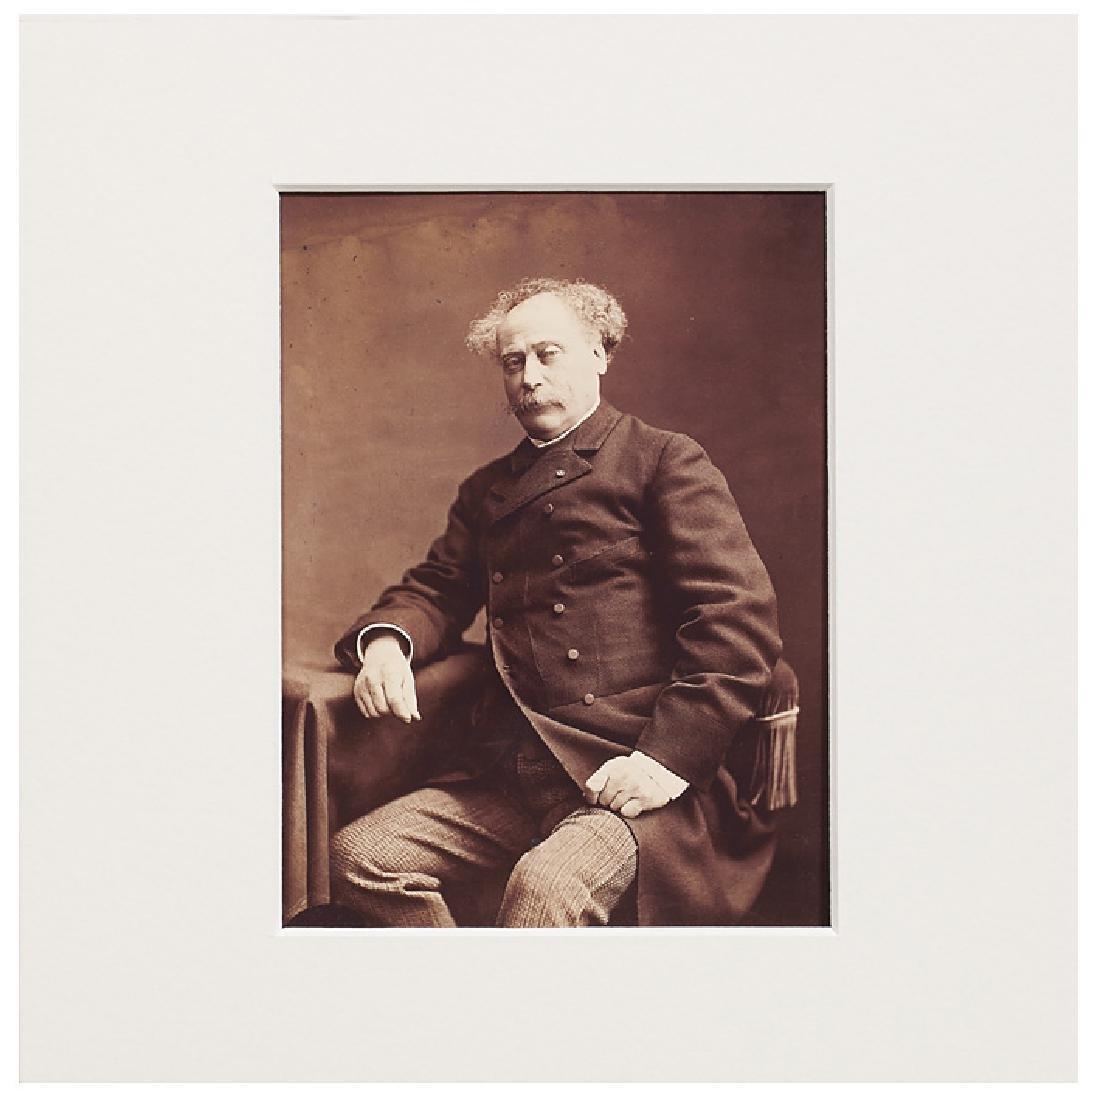 Nadar (French, 1820 - 1910) [Gaspard Félix Tournachon] - 5